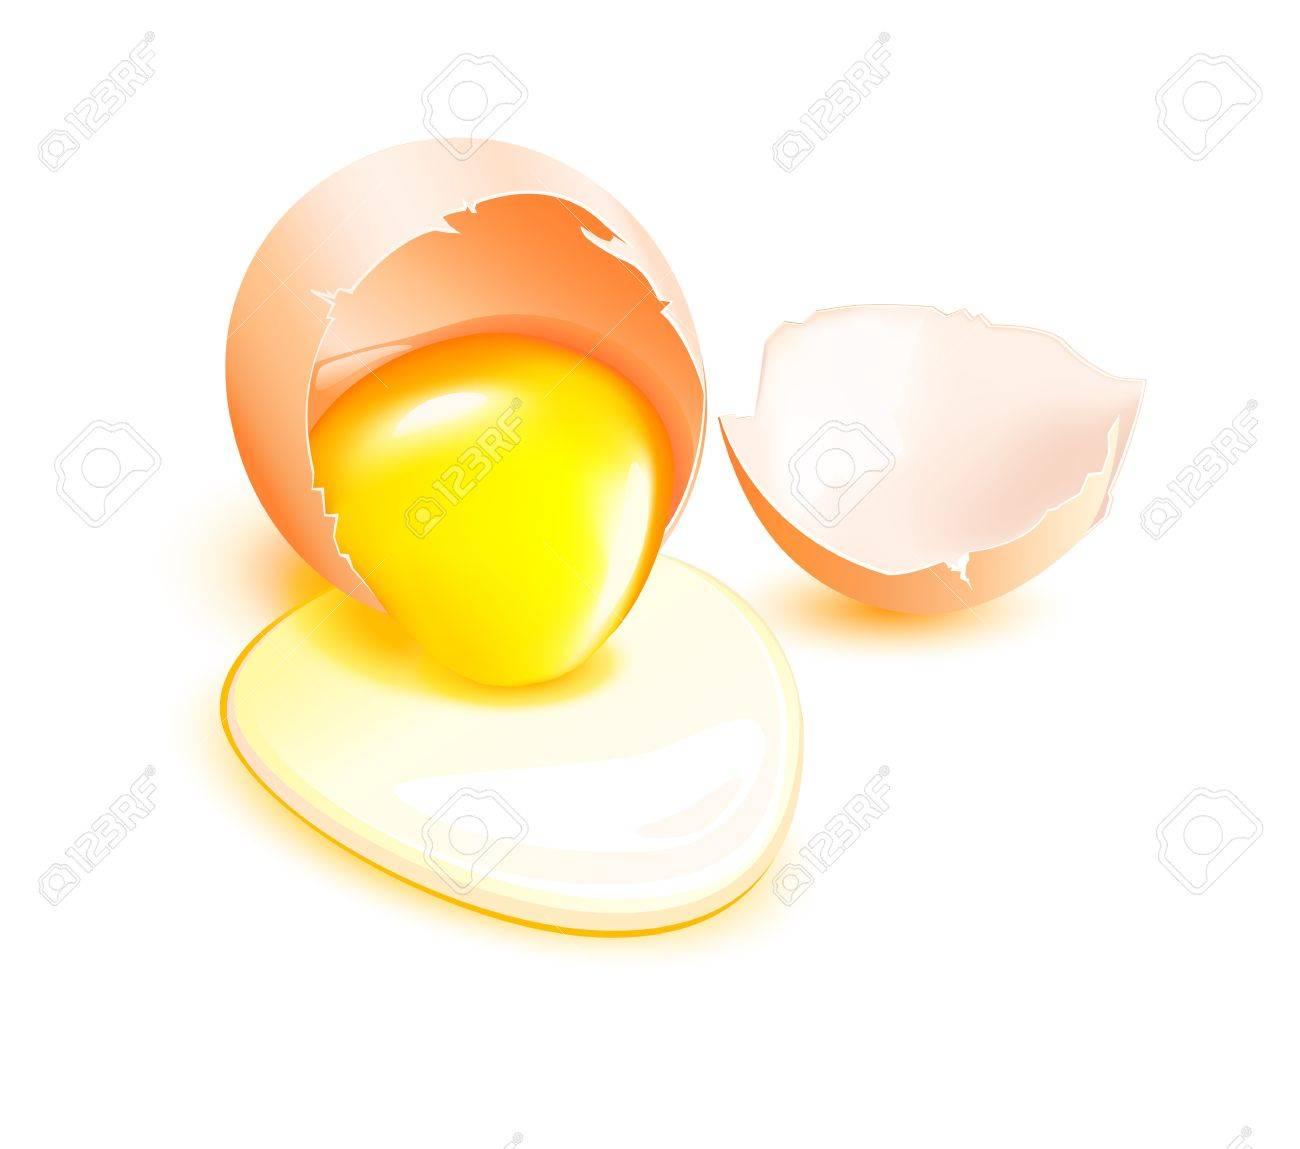 Brown Broken Egg With Flowing Yolk On White Background. Royalty ... for Clipart Yolk  34eri